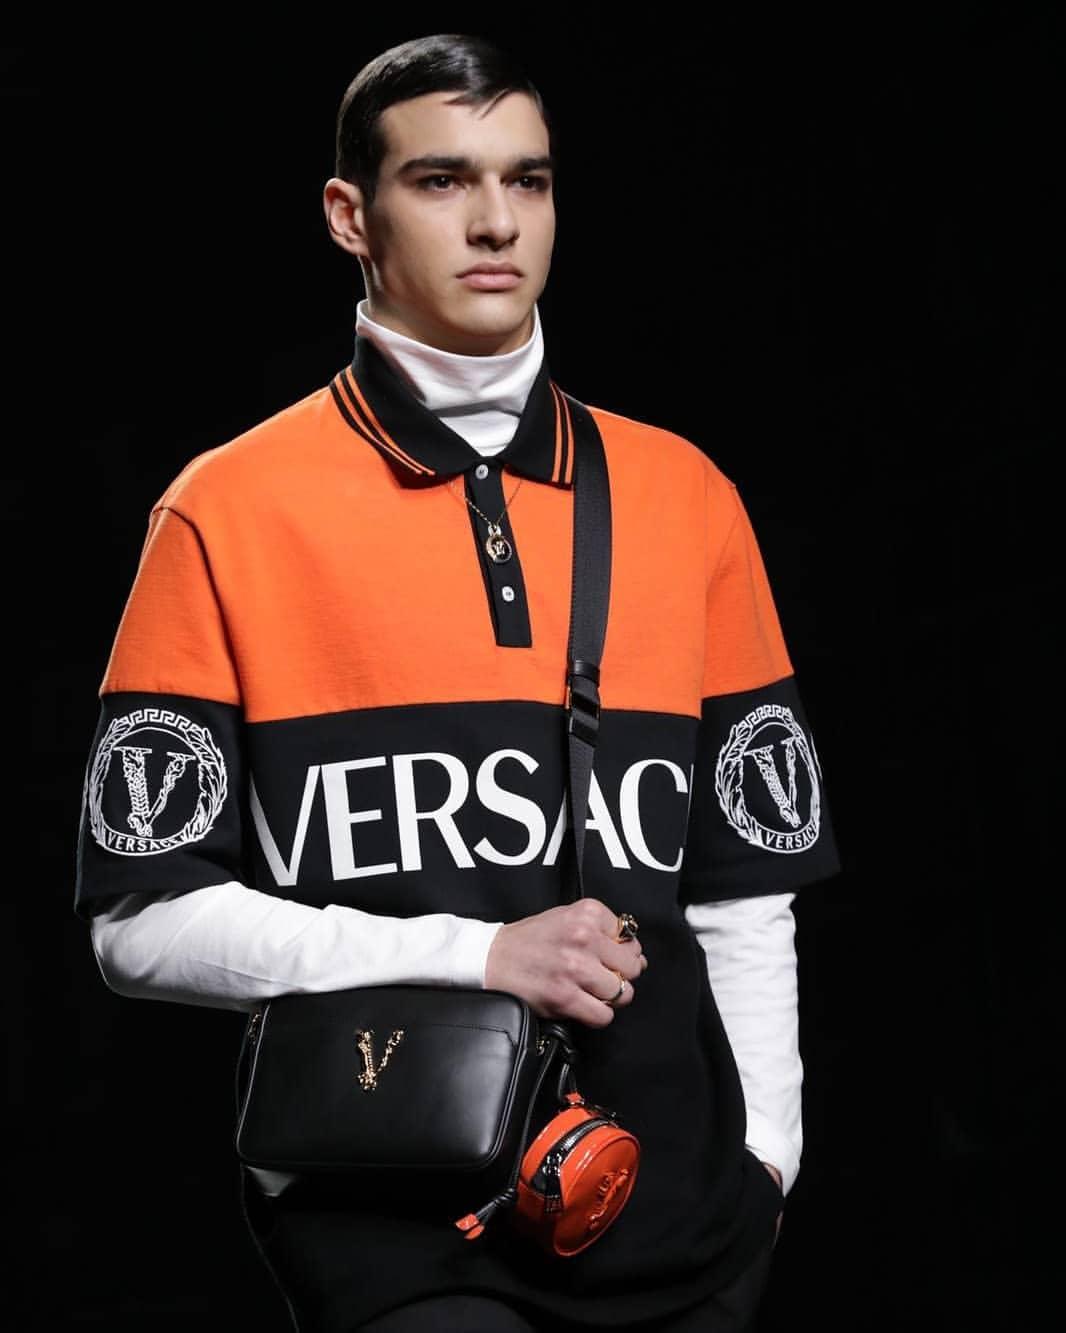 Sfilata Versace - Neomag.